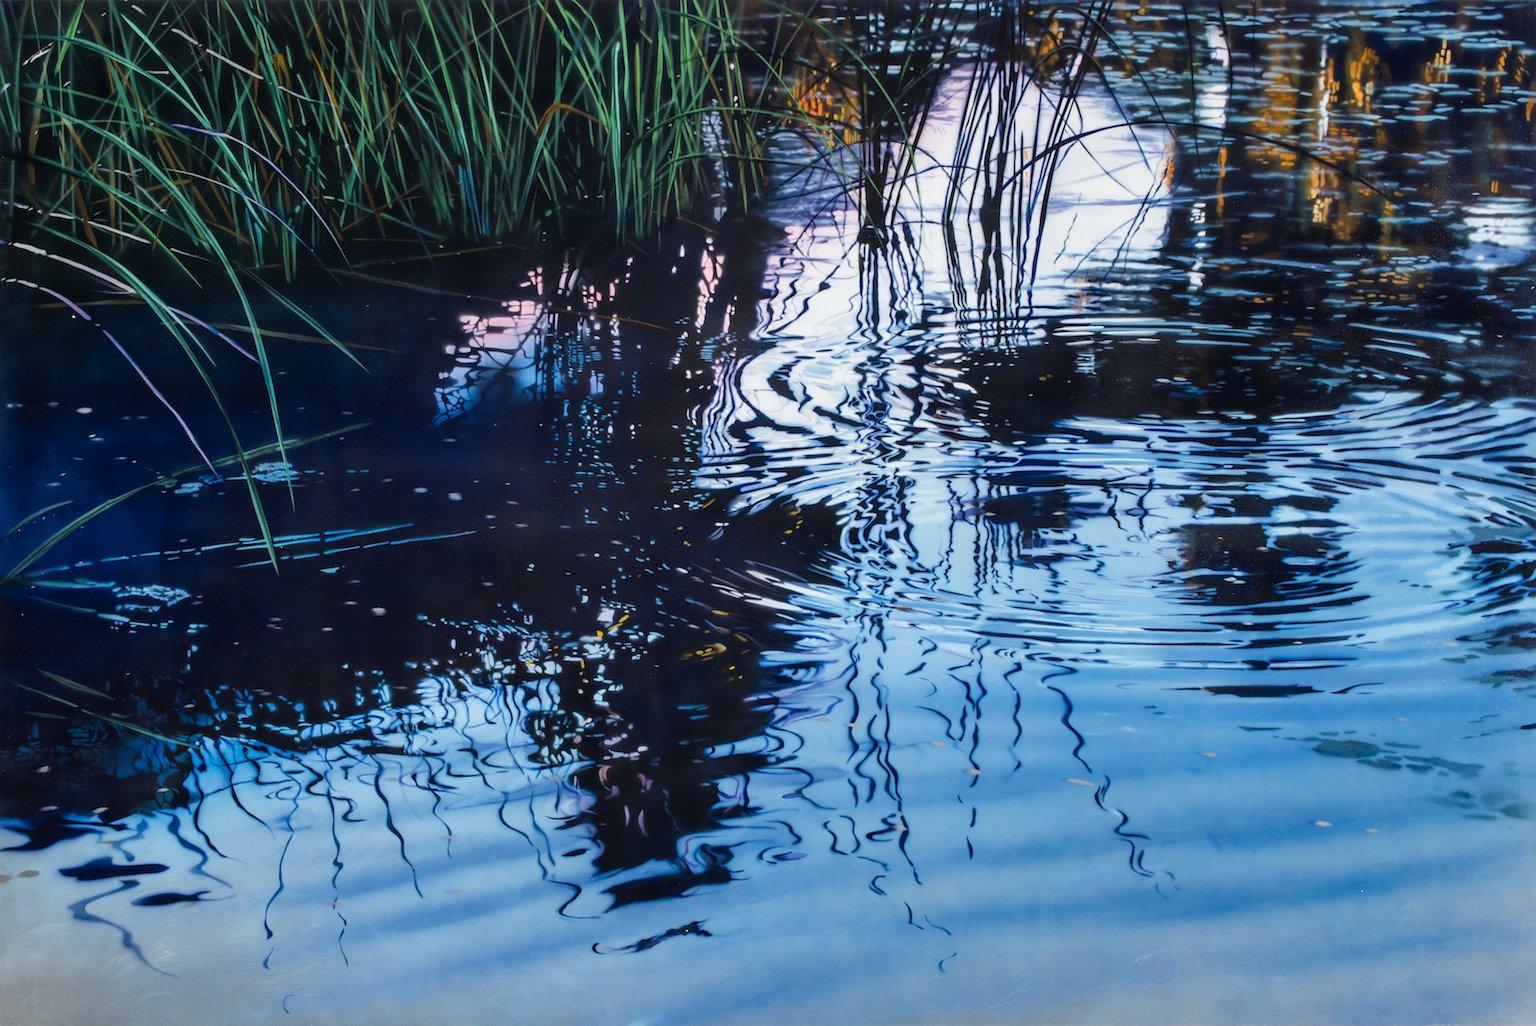 Evening Lace, David Kessler.